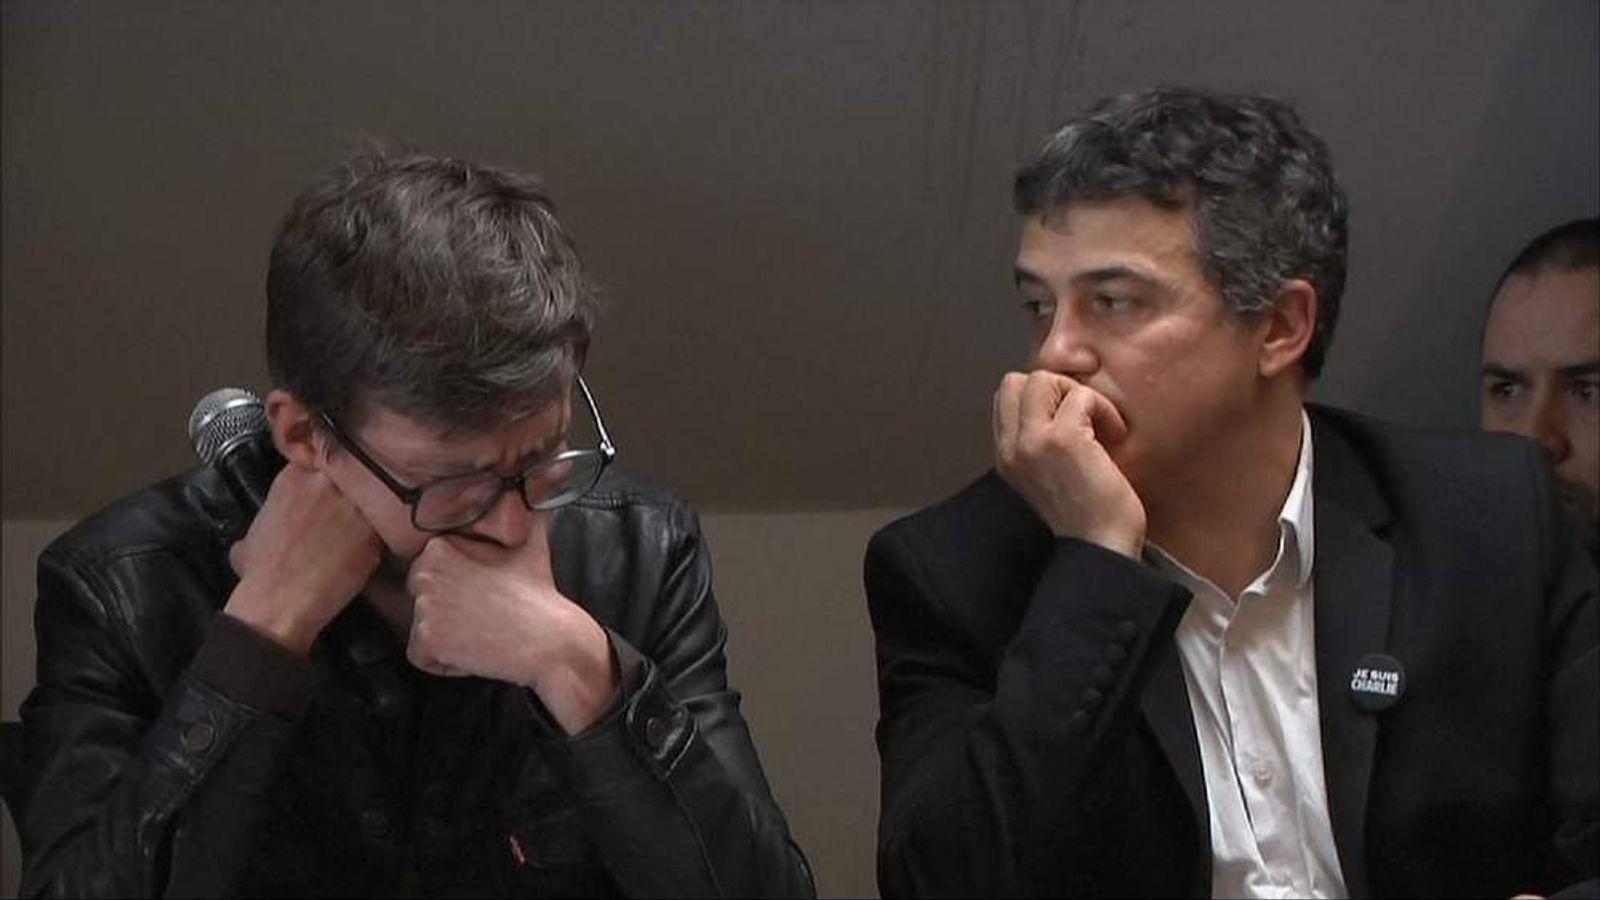 Charlie Hebdo news conference